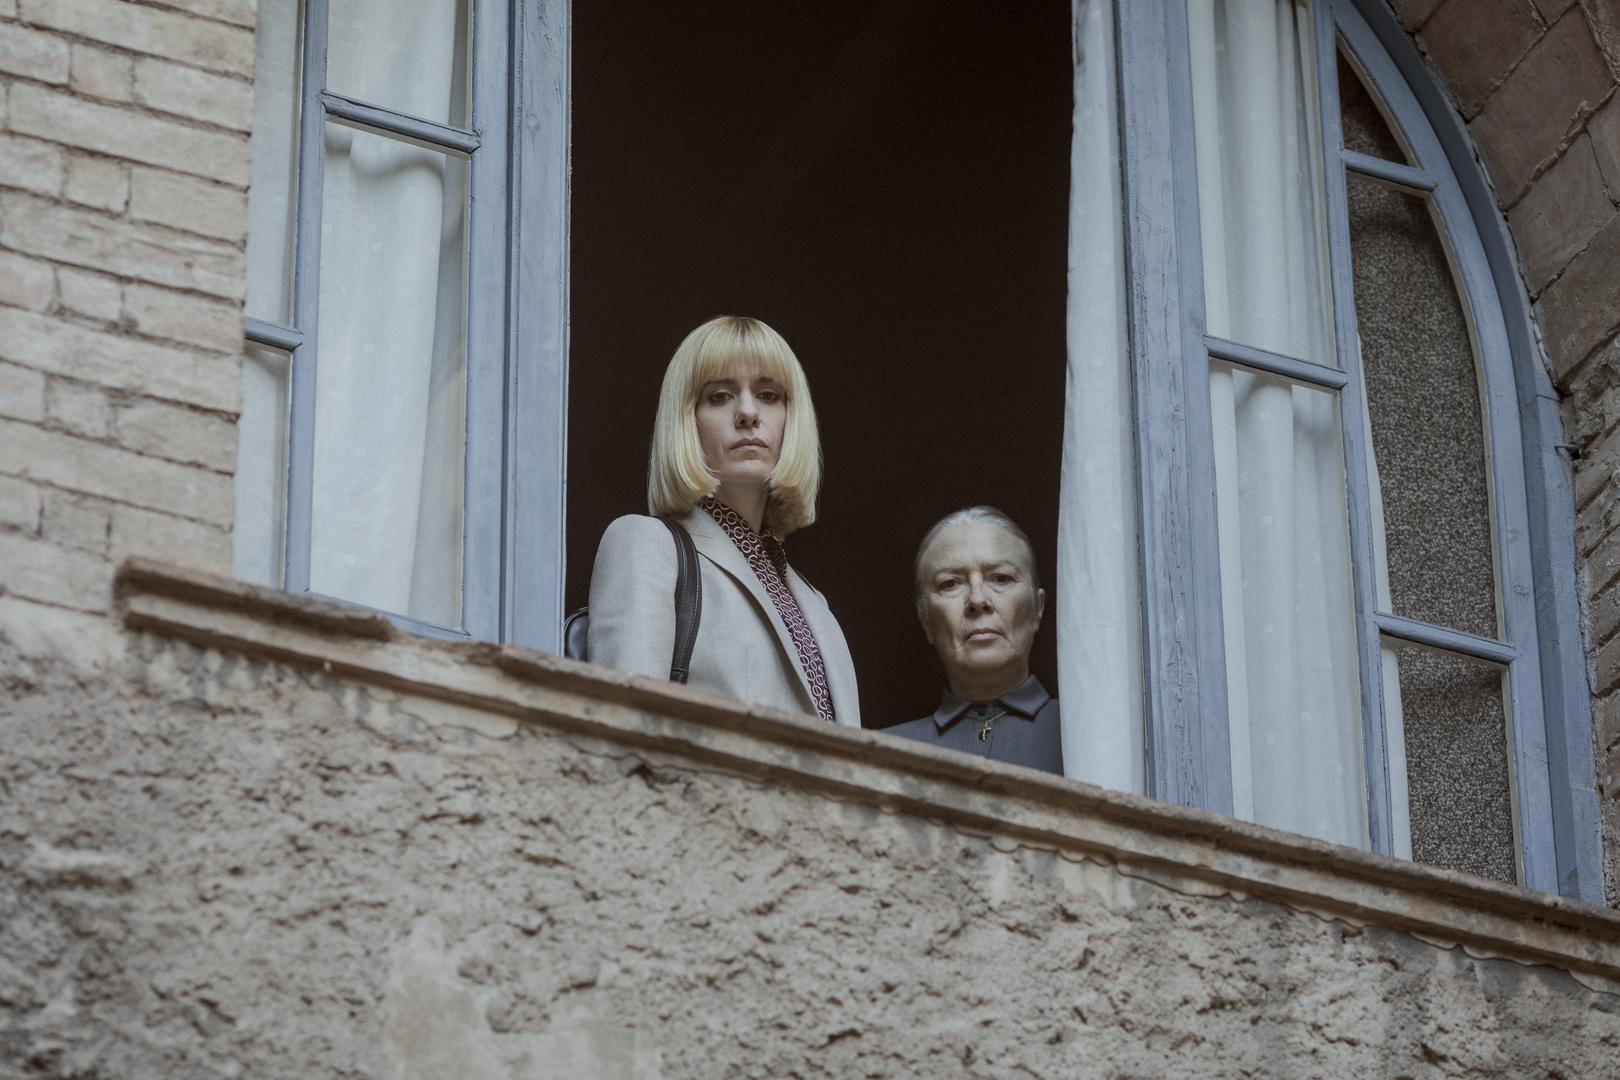 El inocente - serie netflix - Alexandra Jiménez y Susi Sánchez